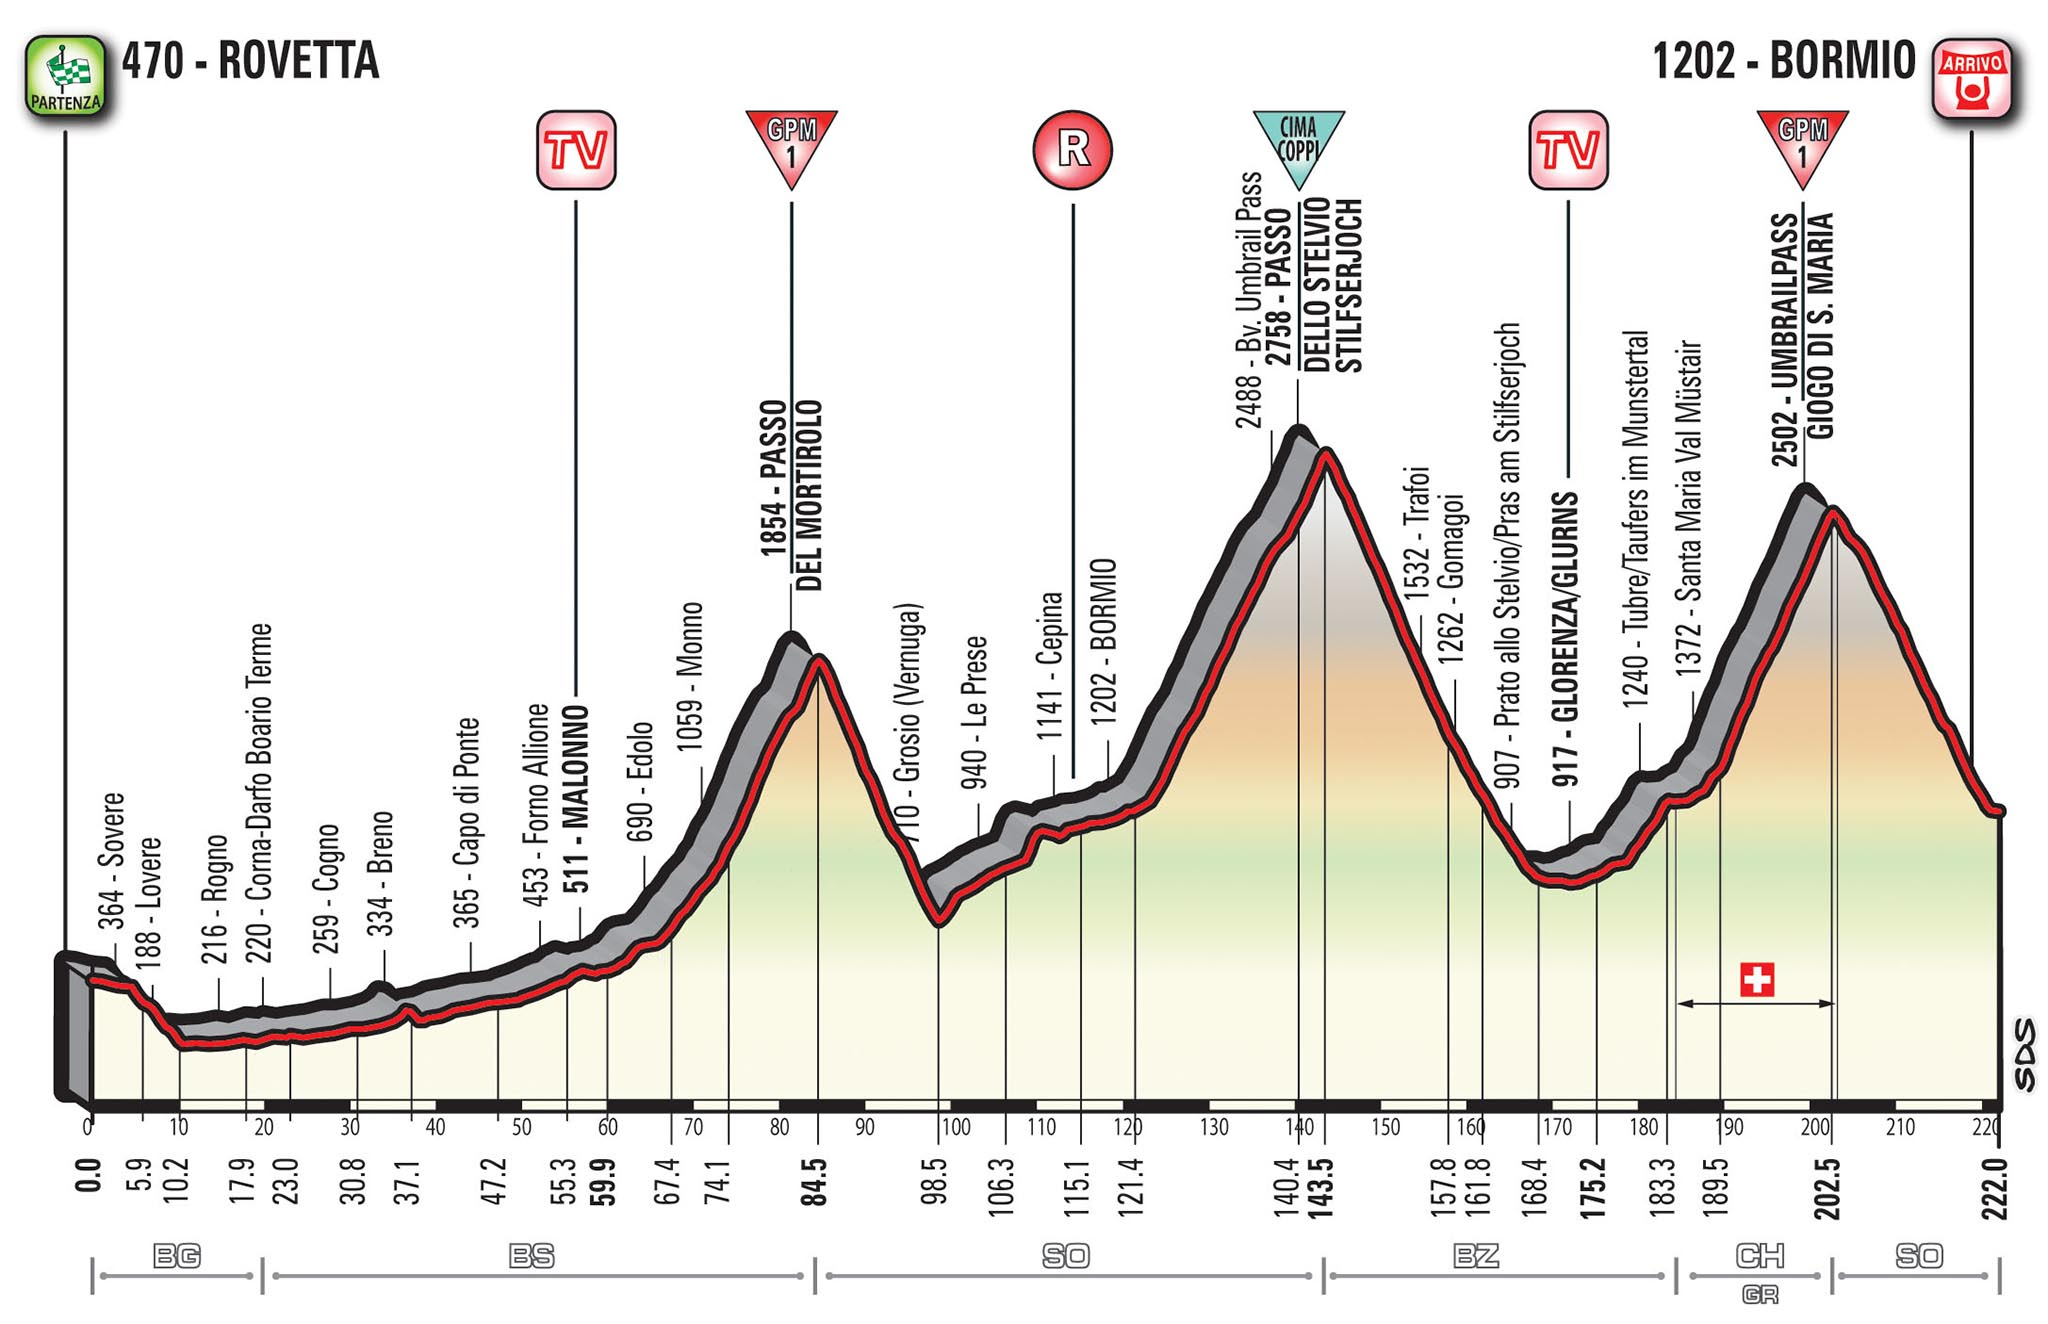 Profil 16. etapy Giro d'Italia 2017